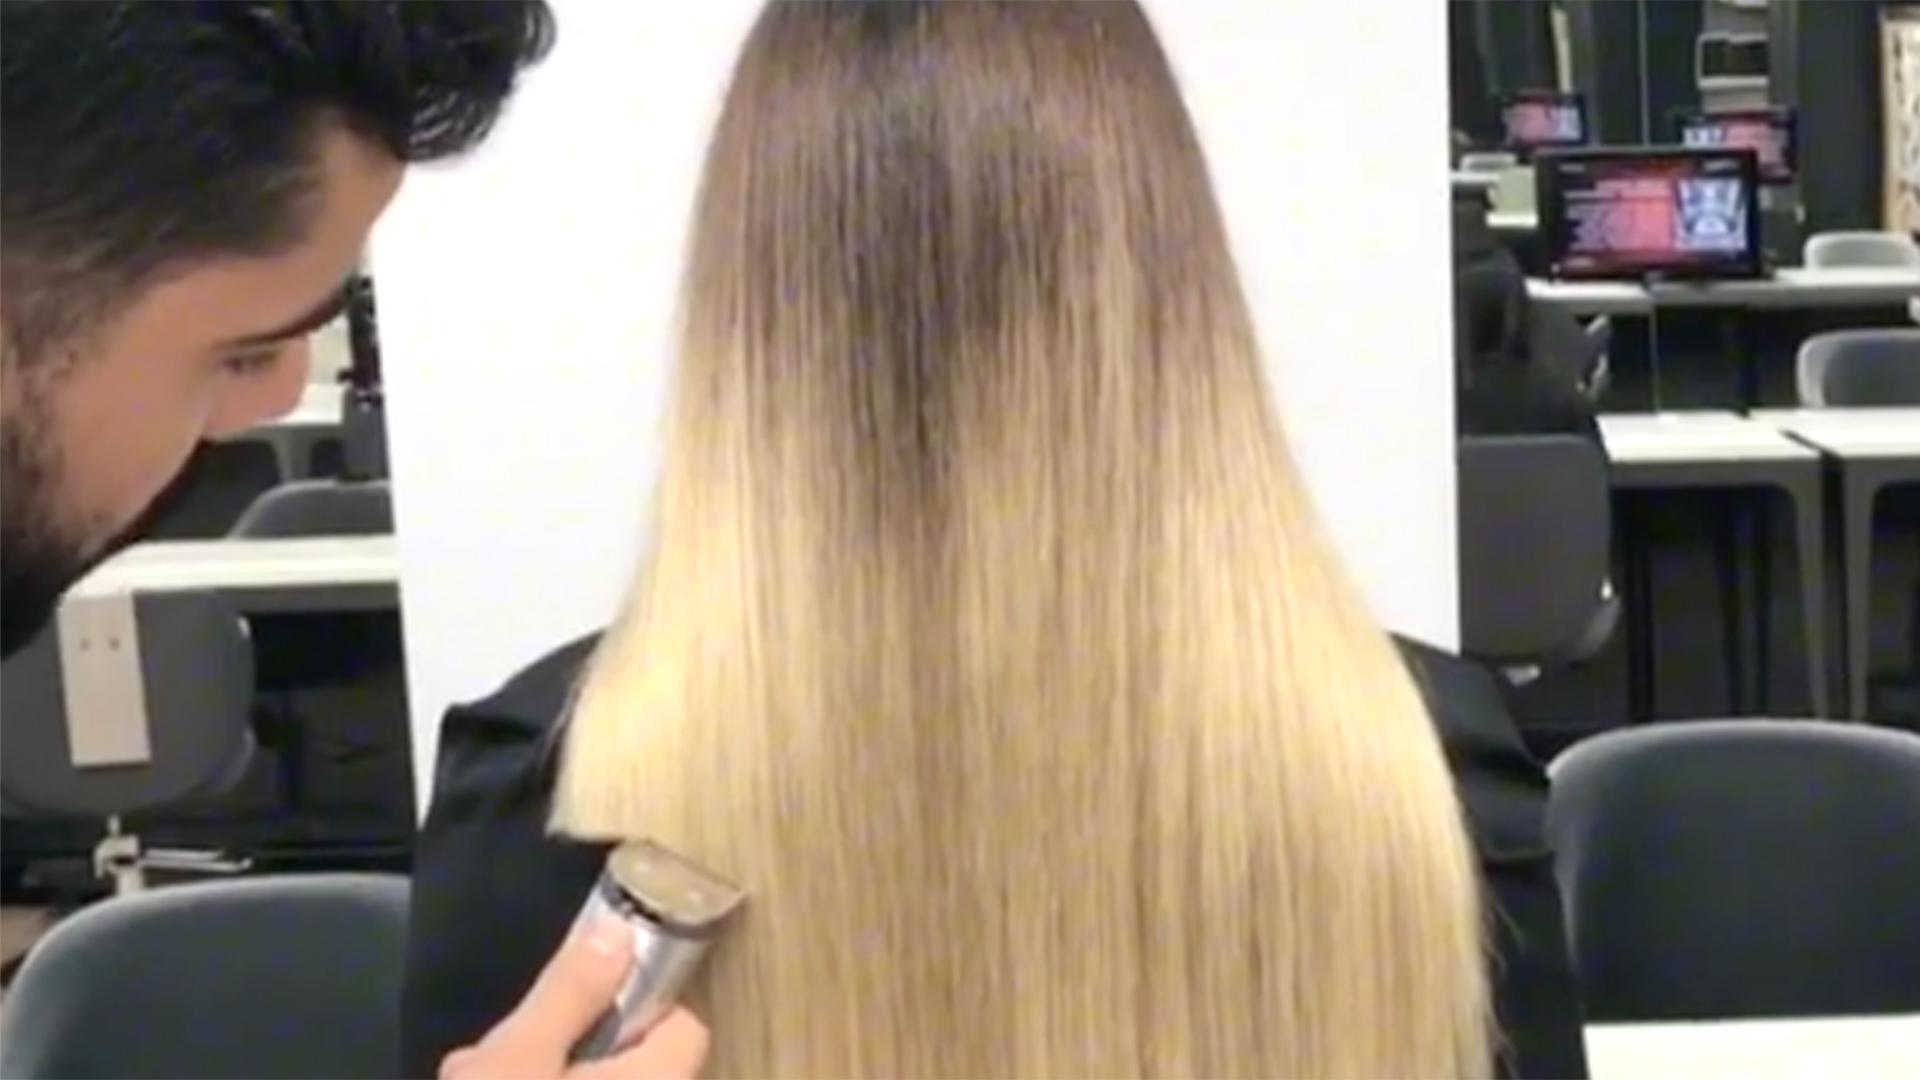 Emre Ayaksizs Instagram Haircut Video Goes Viral